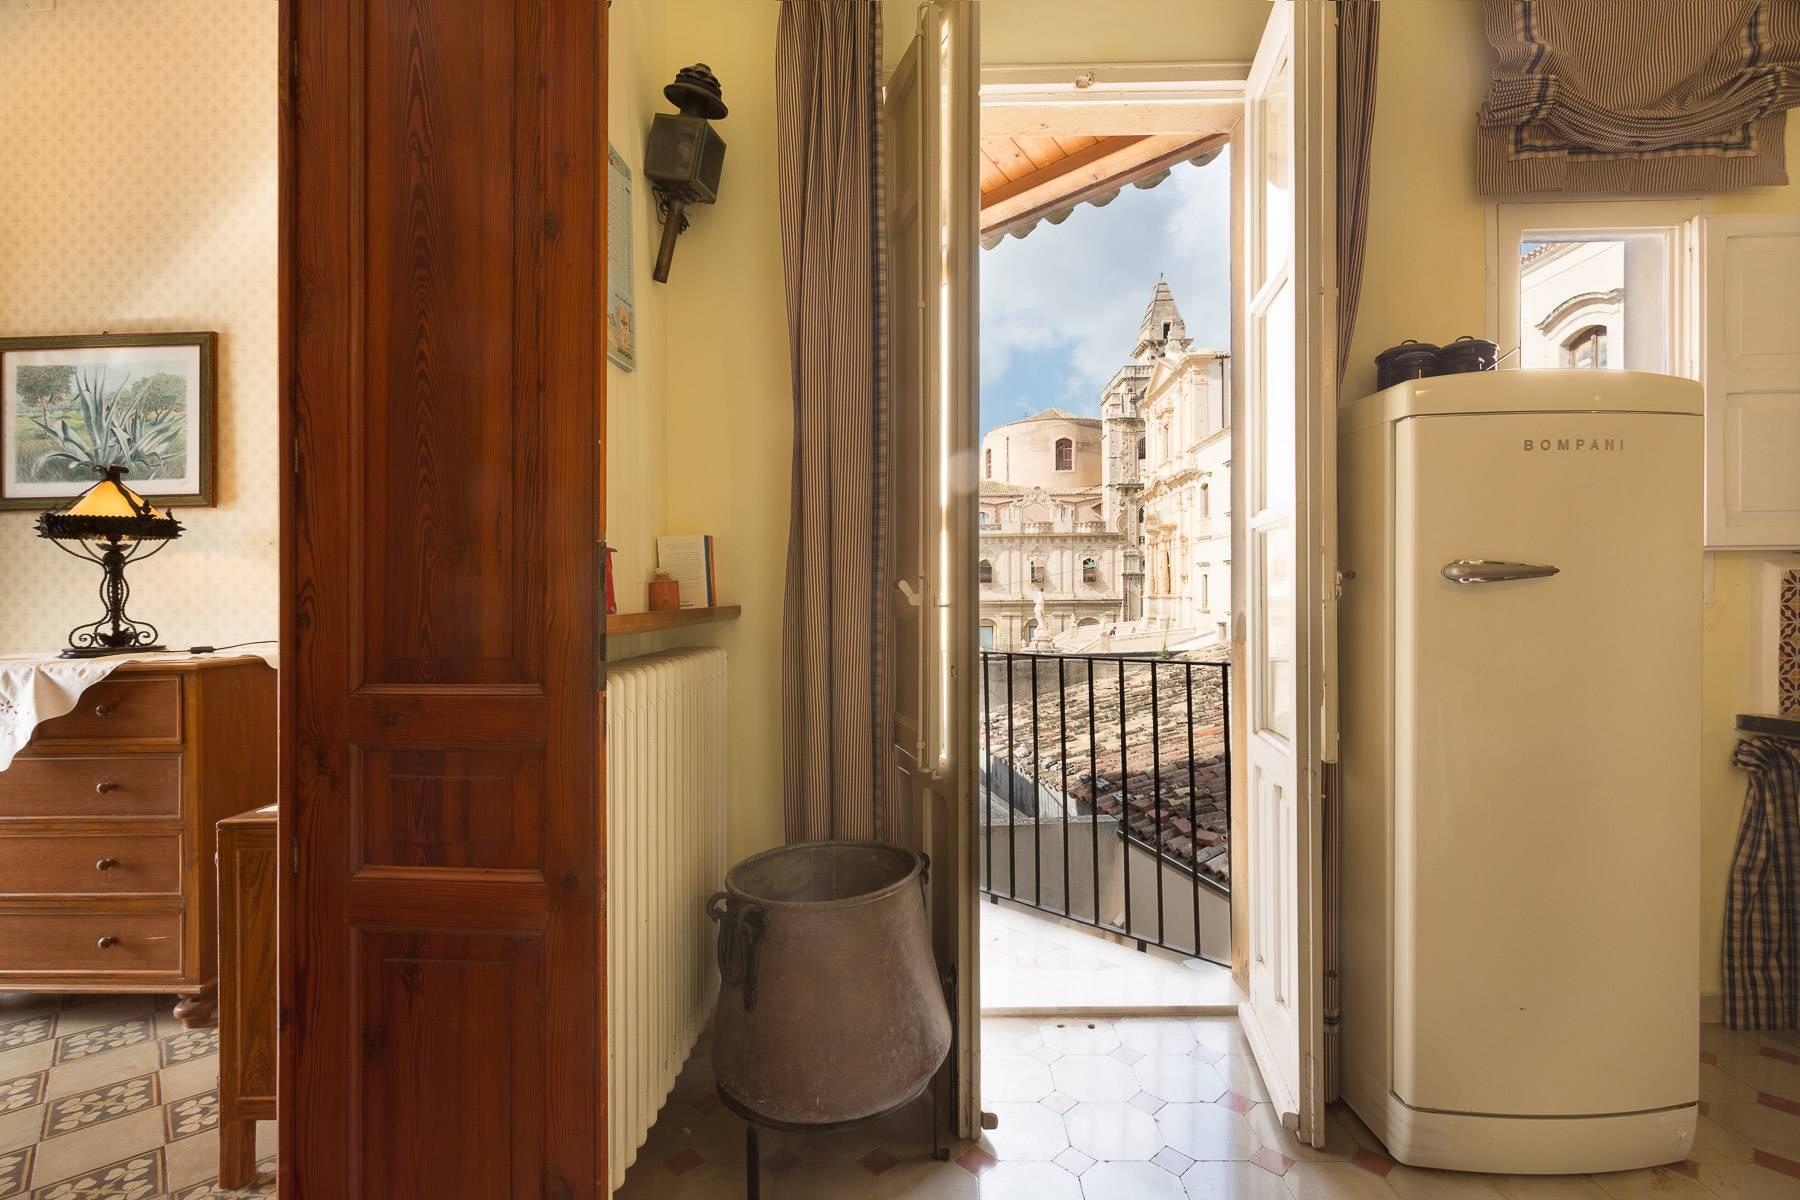 Casa indipendente in Vendita a Noto: 5 locali, 280 mq - Foto 4